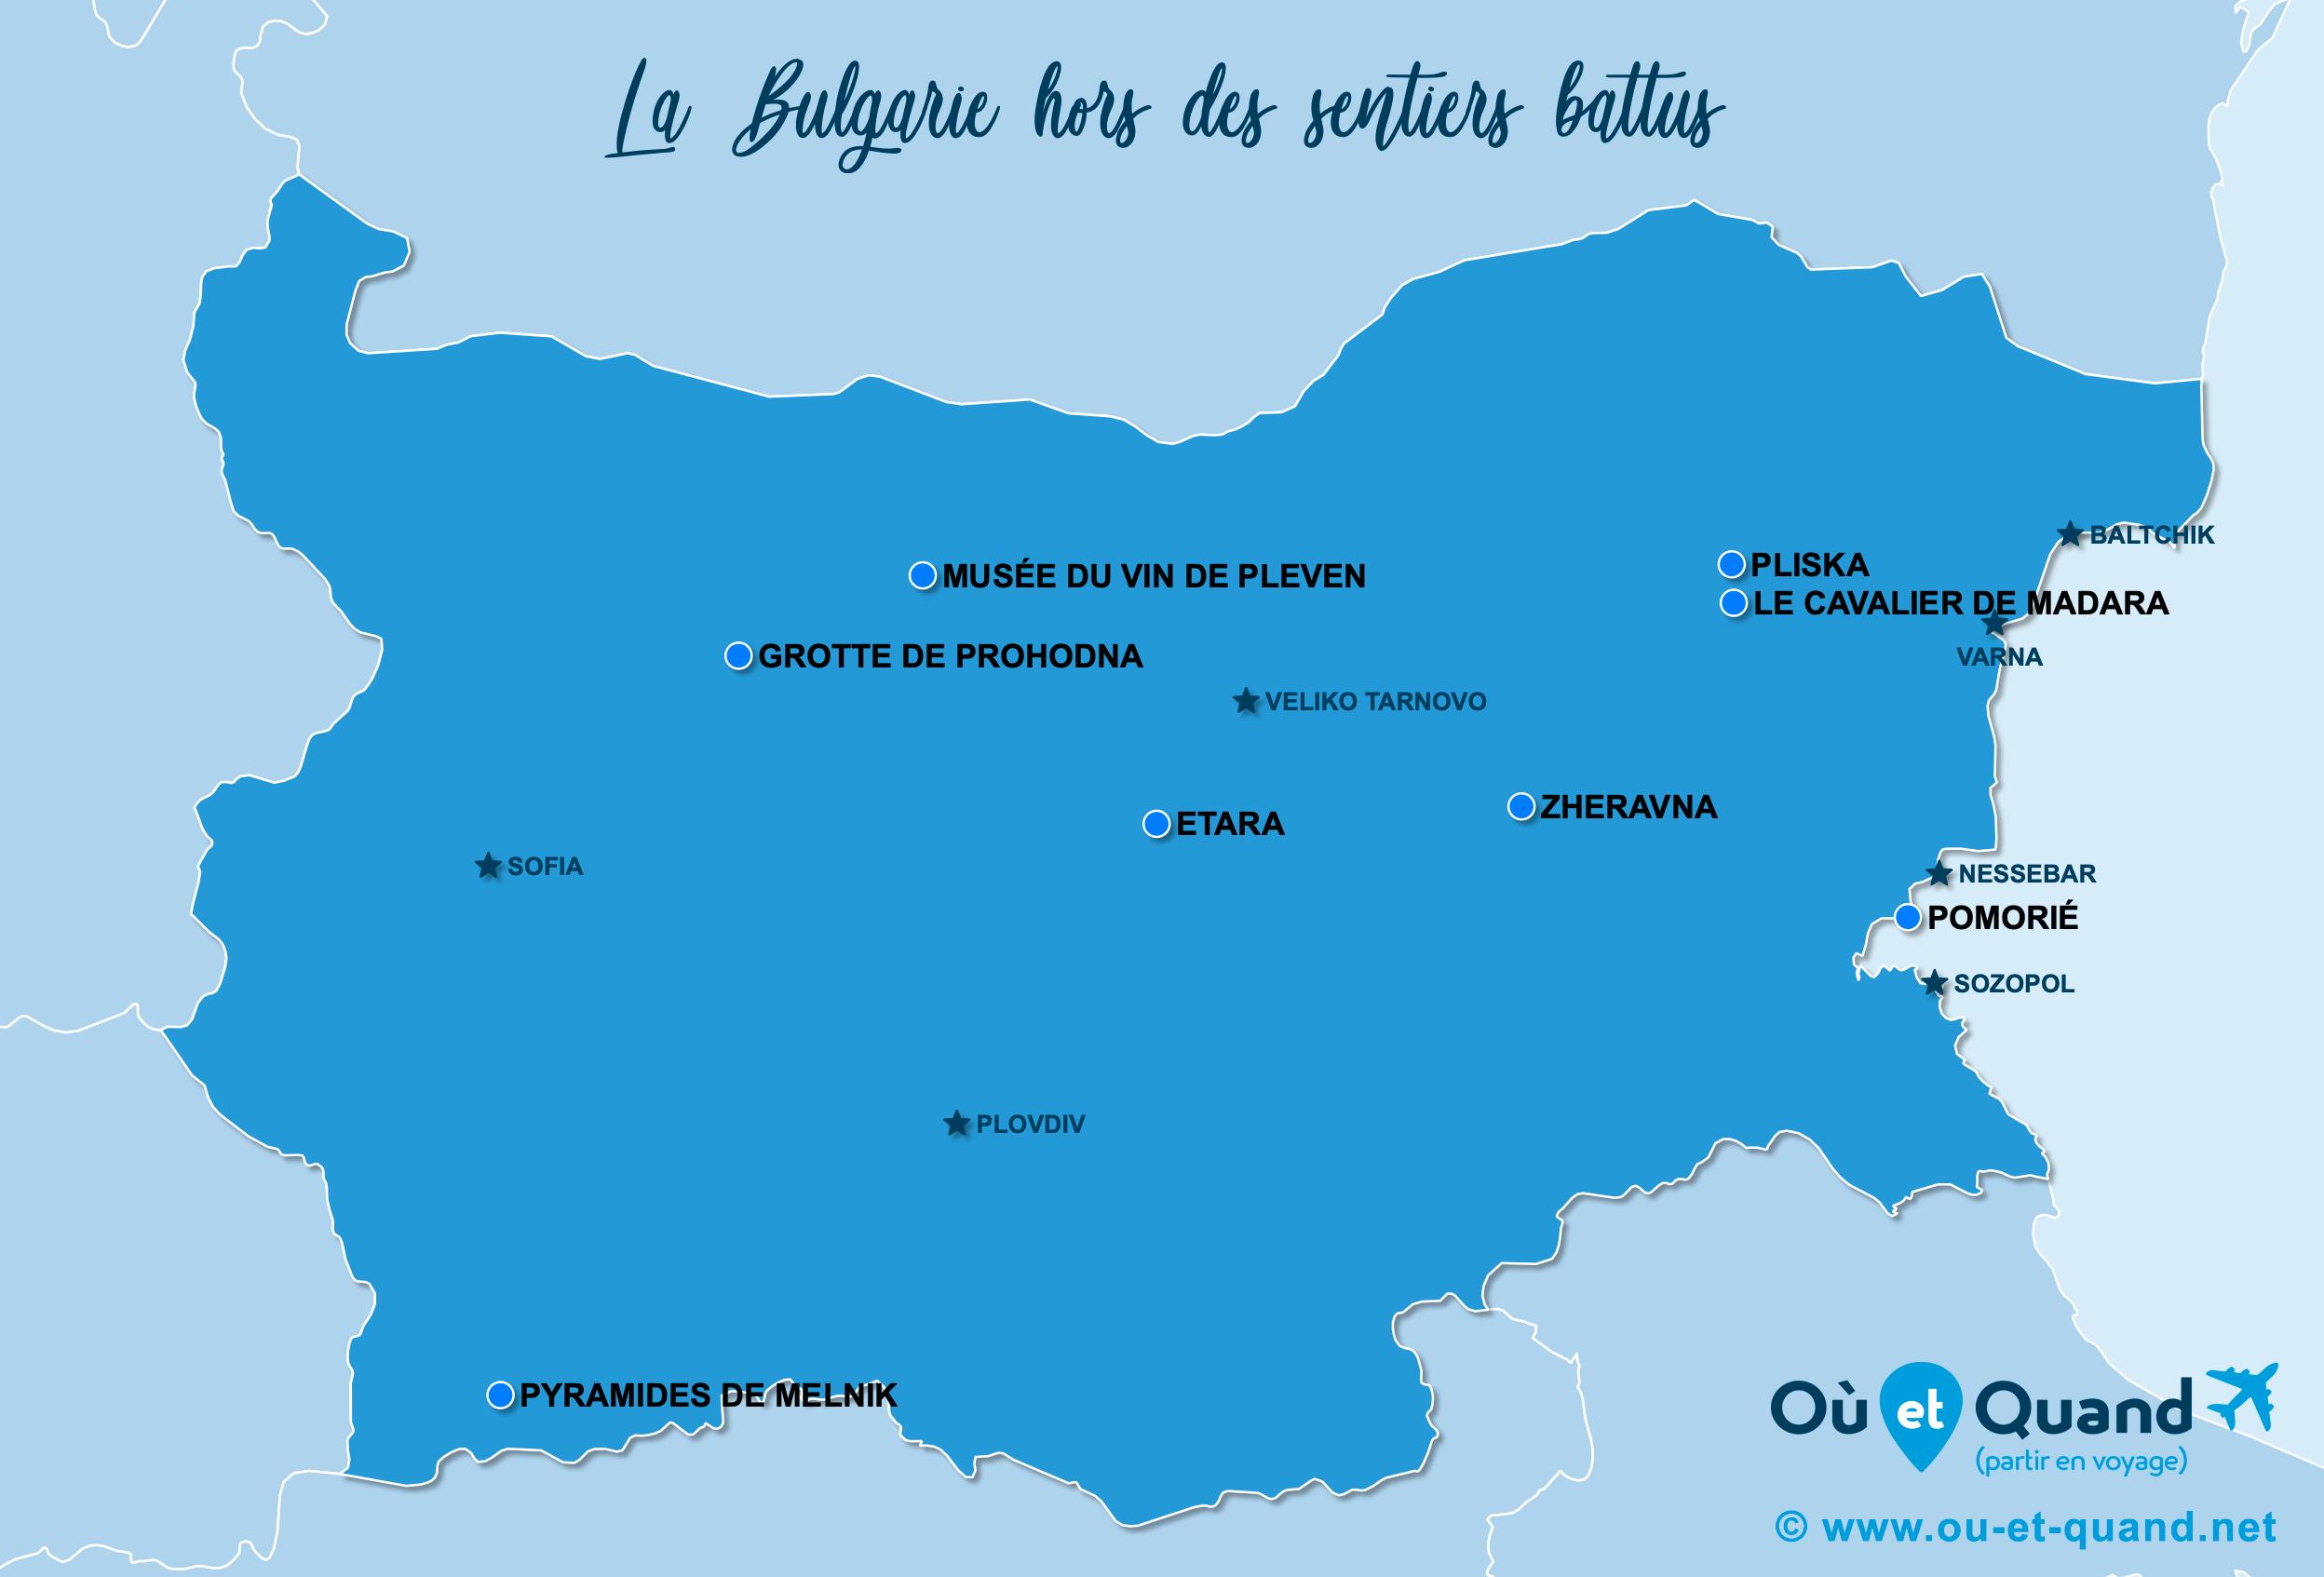 Carte Bulgarie : La Bulgarie hors des sentiers battus